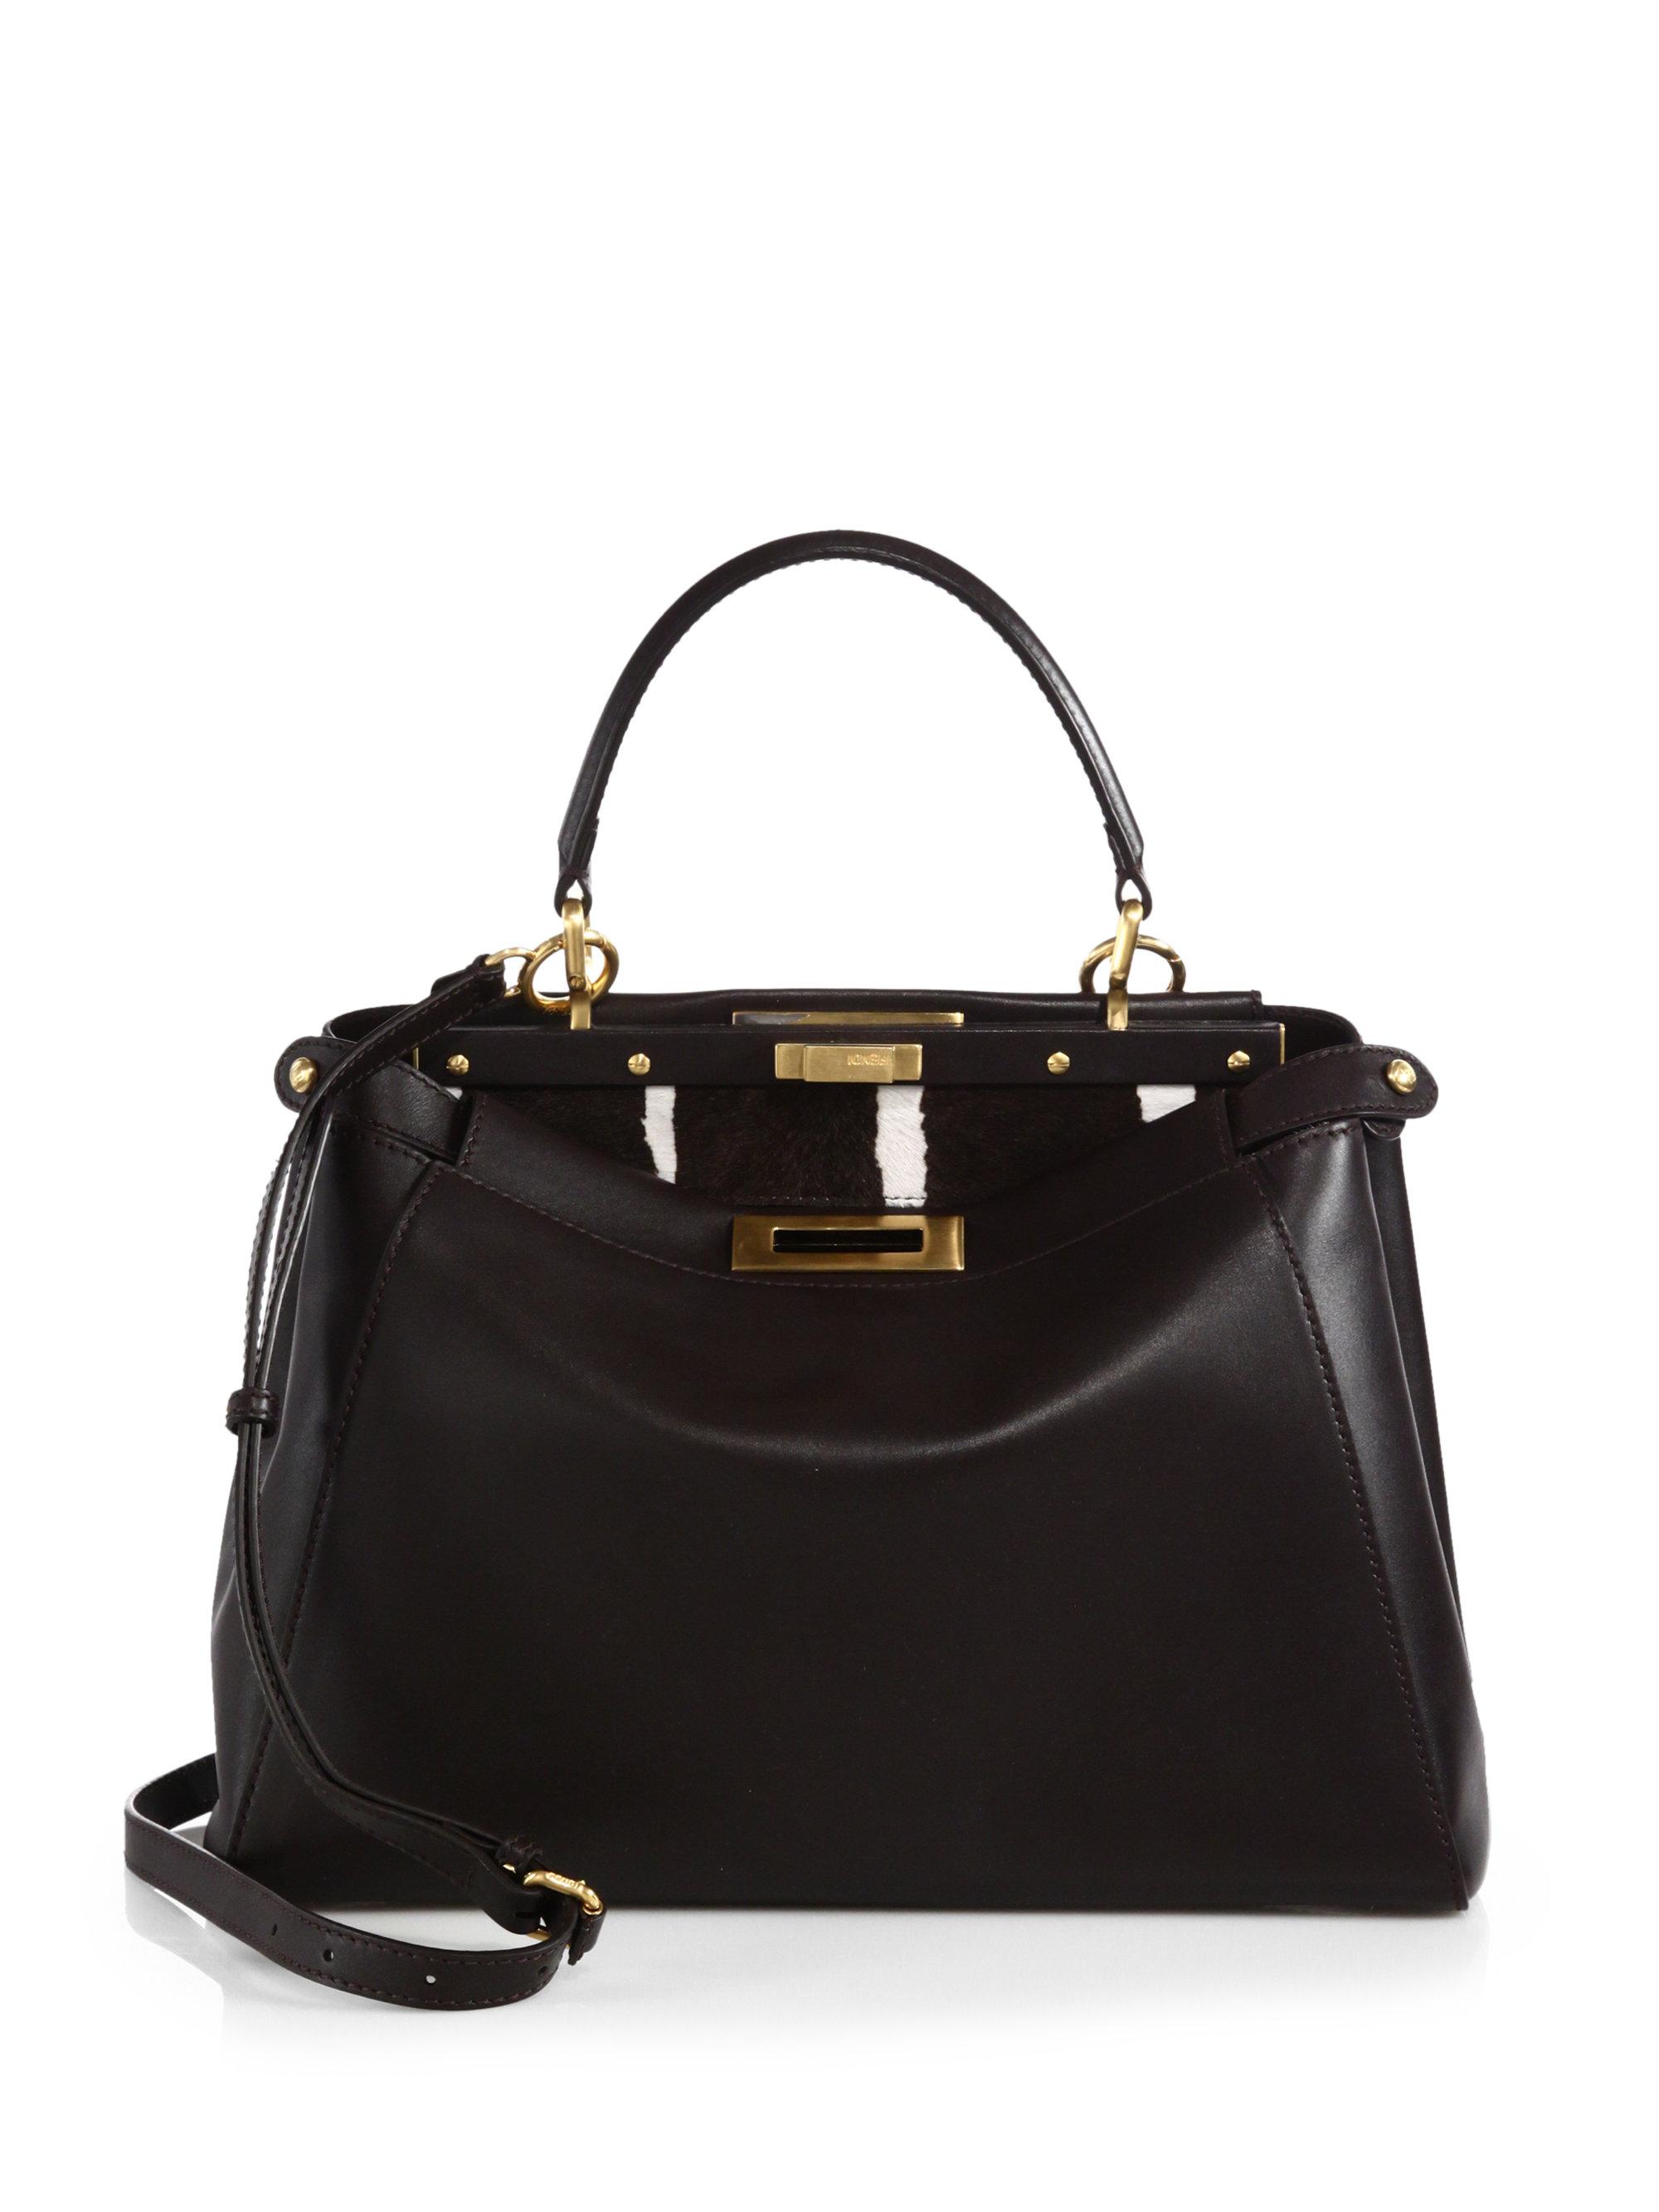 chloe black handbag - fendi peekaboo medium leather satchel, replica fendi bags